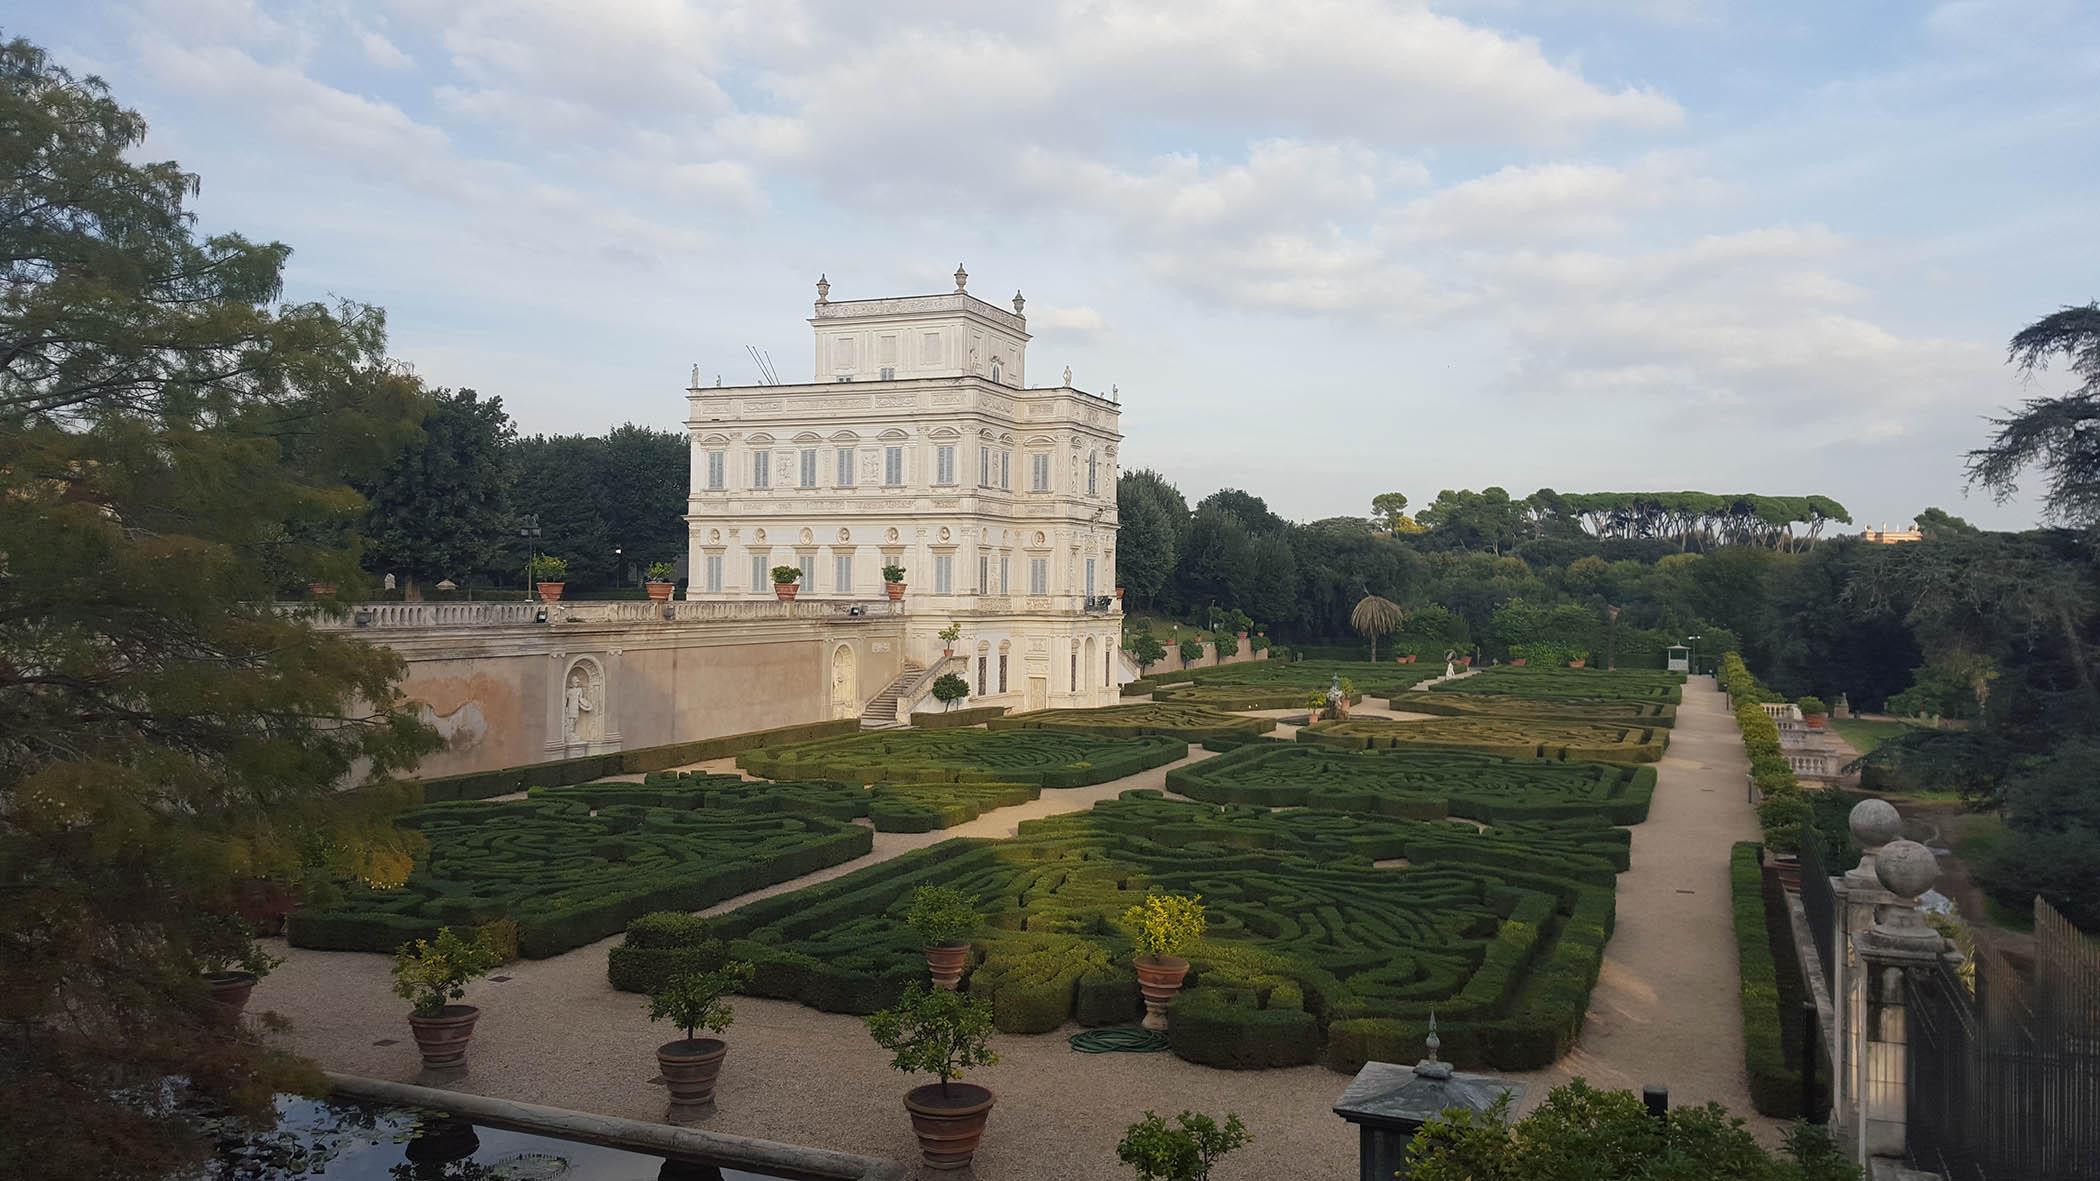 Villa Doria Panphilii - Rome car tour